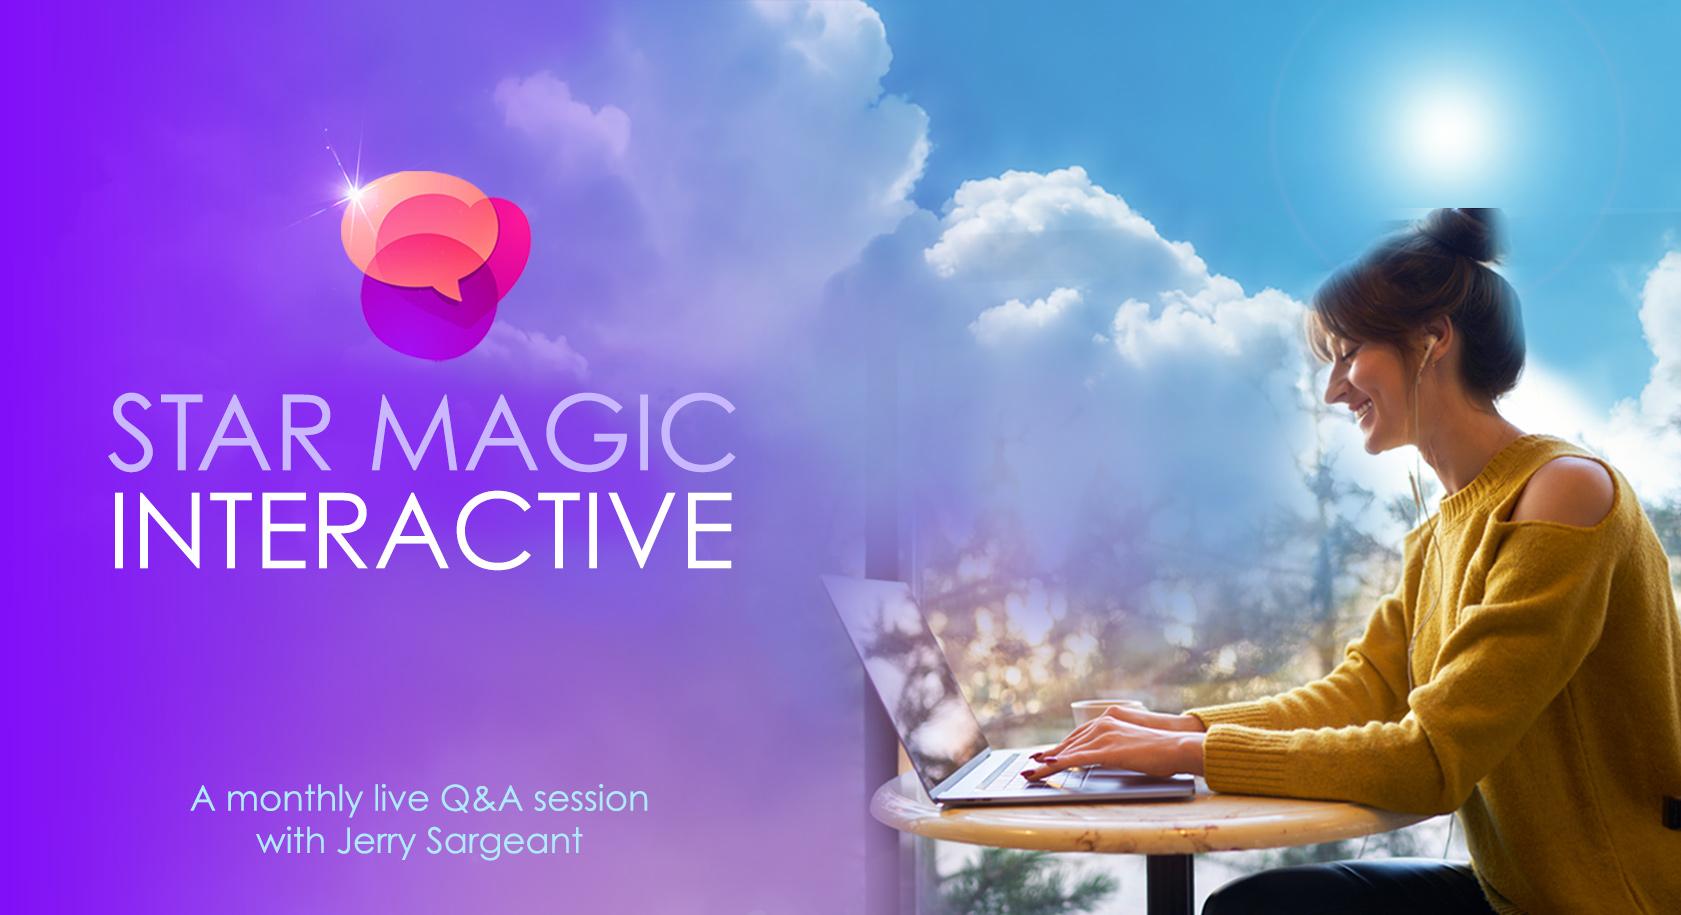 Star magic healing interactive